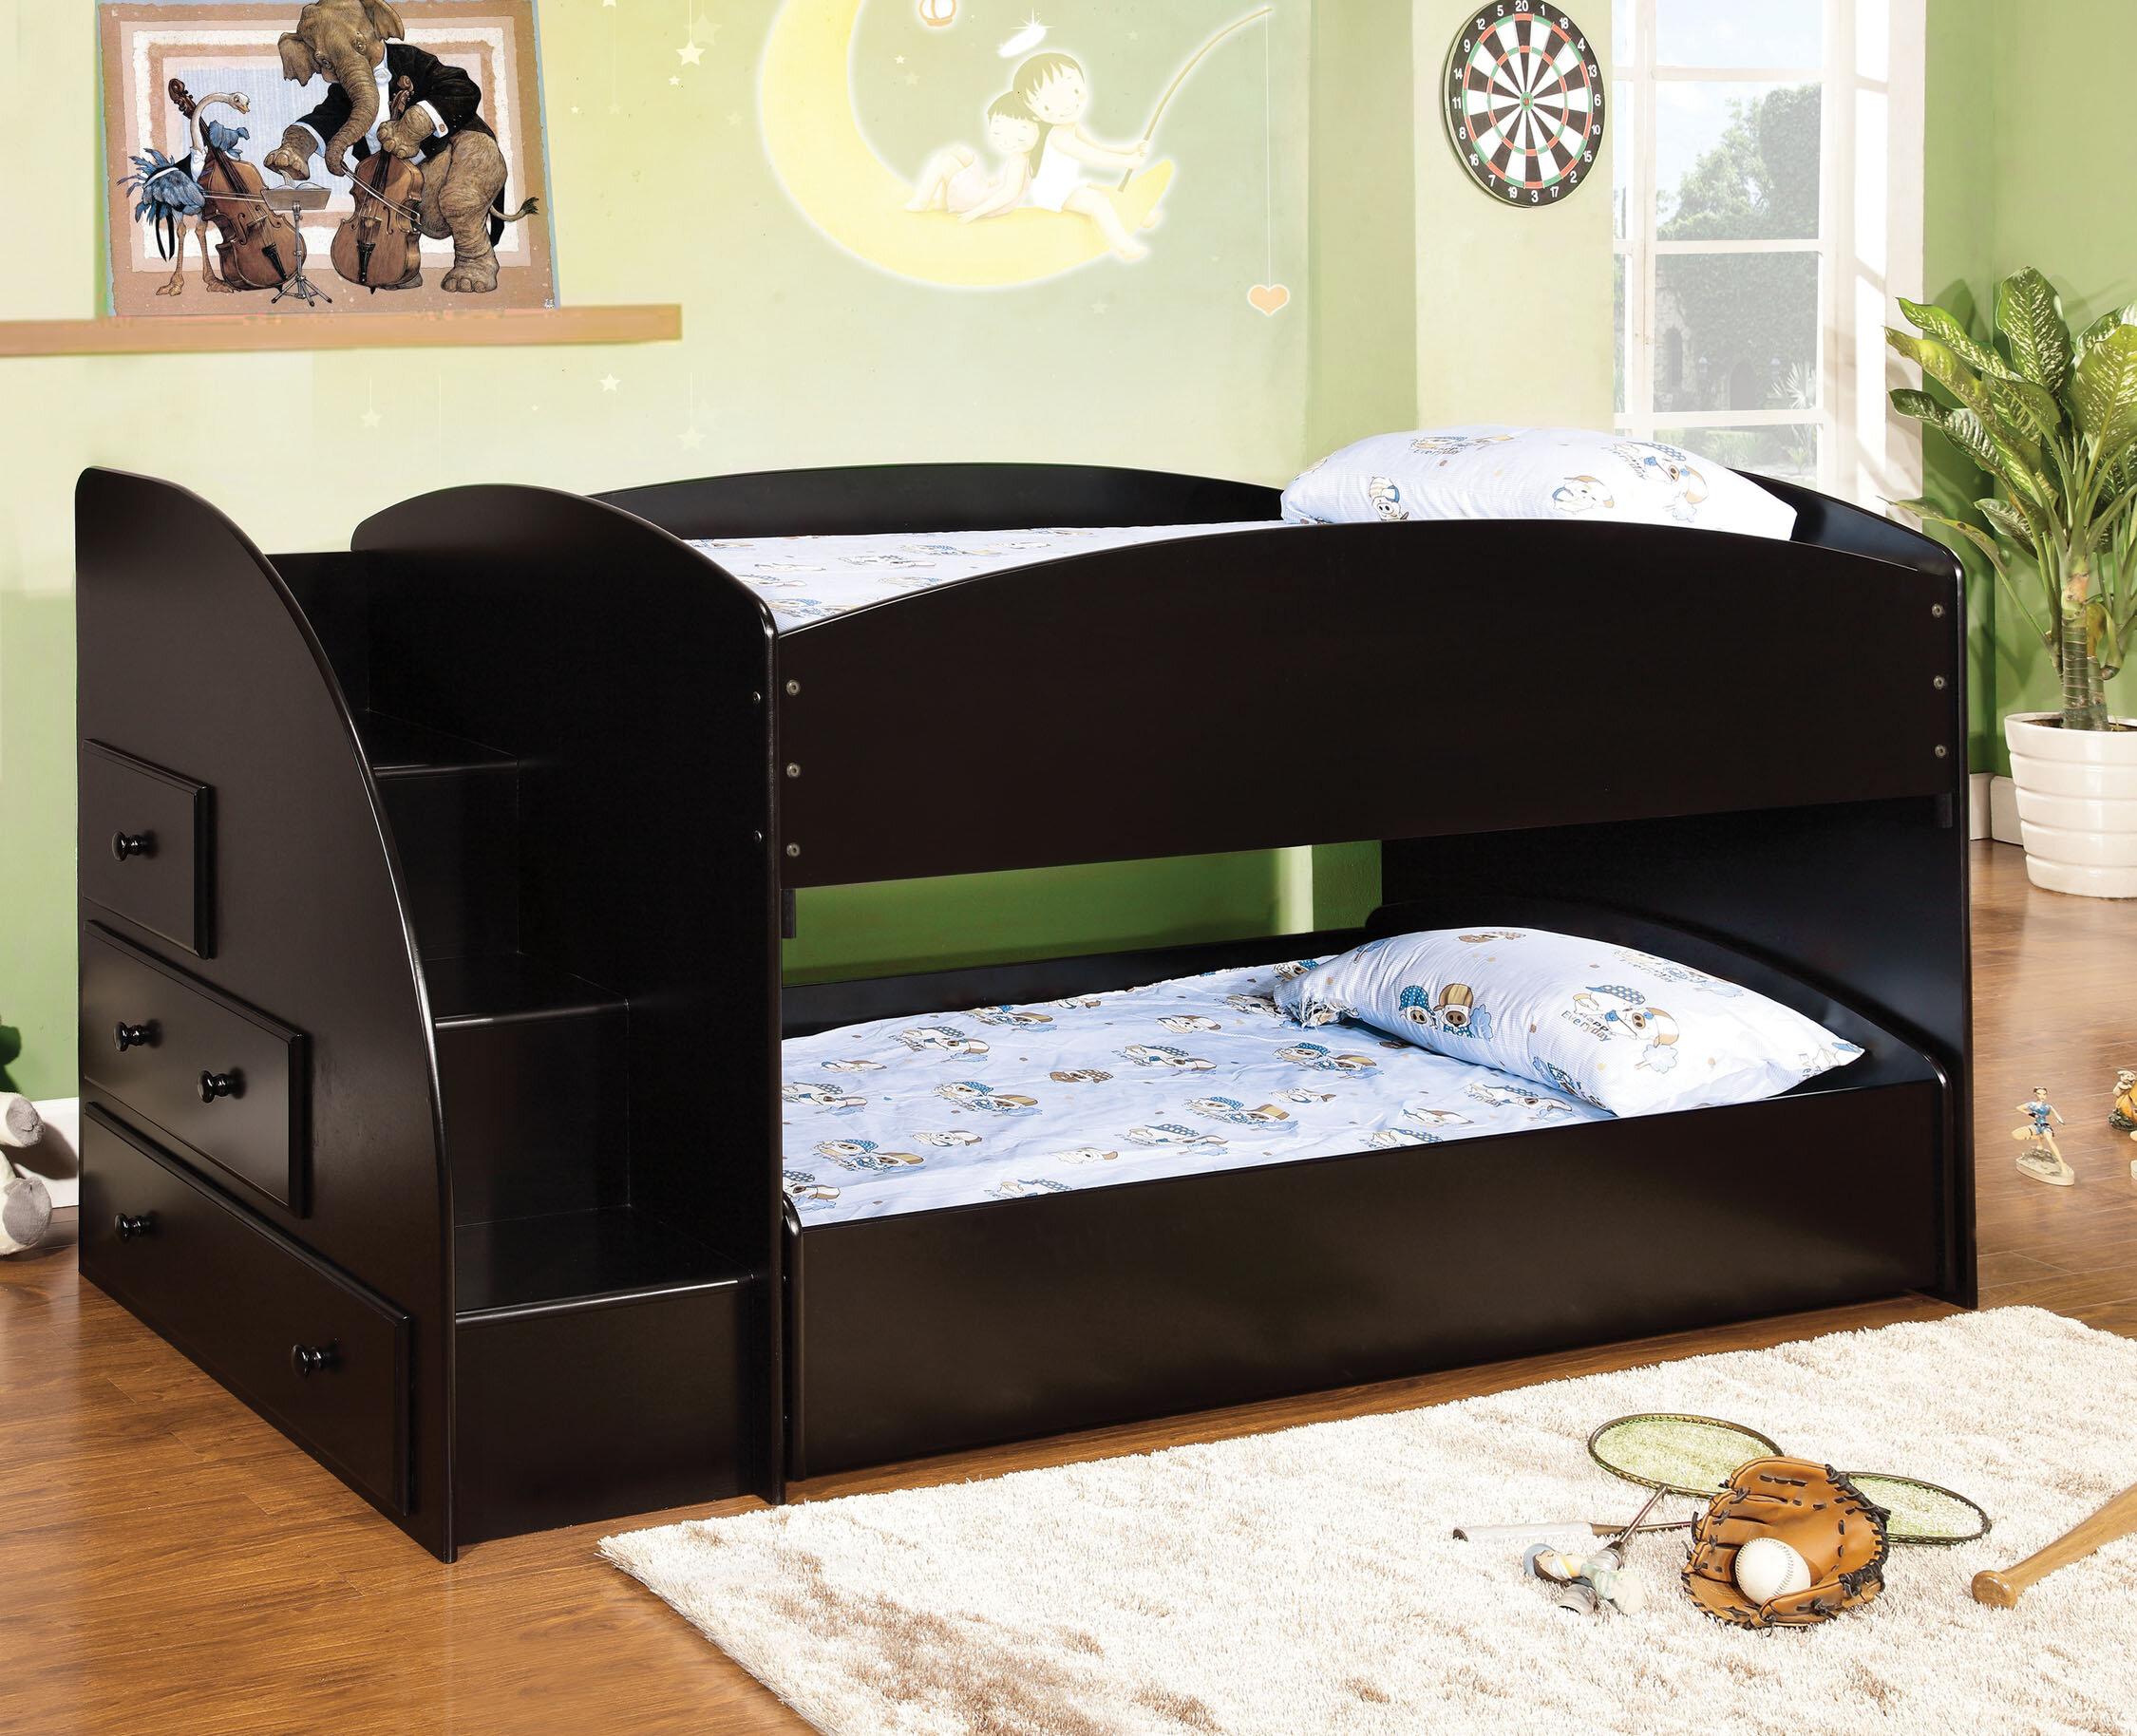 Hokku Designs Jamie Twin Bunk Bed With Storage Reviews Wayfair